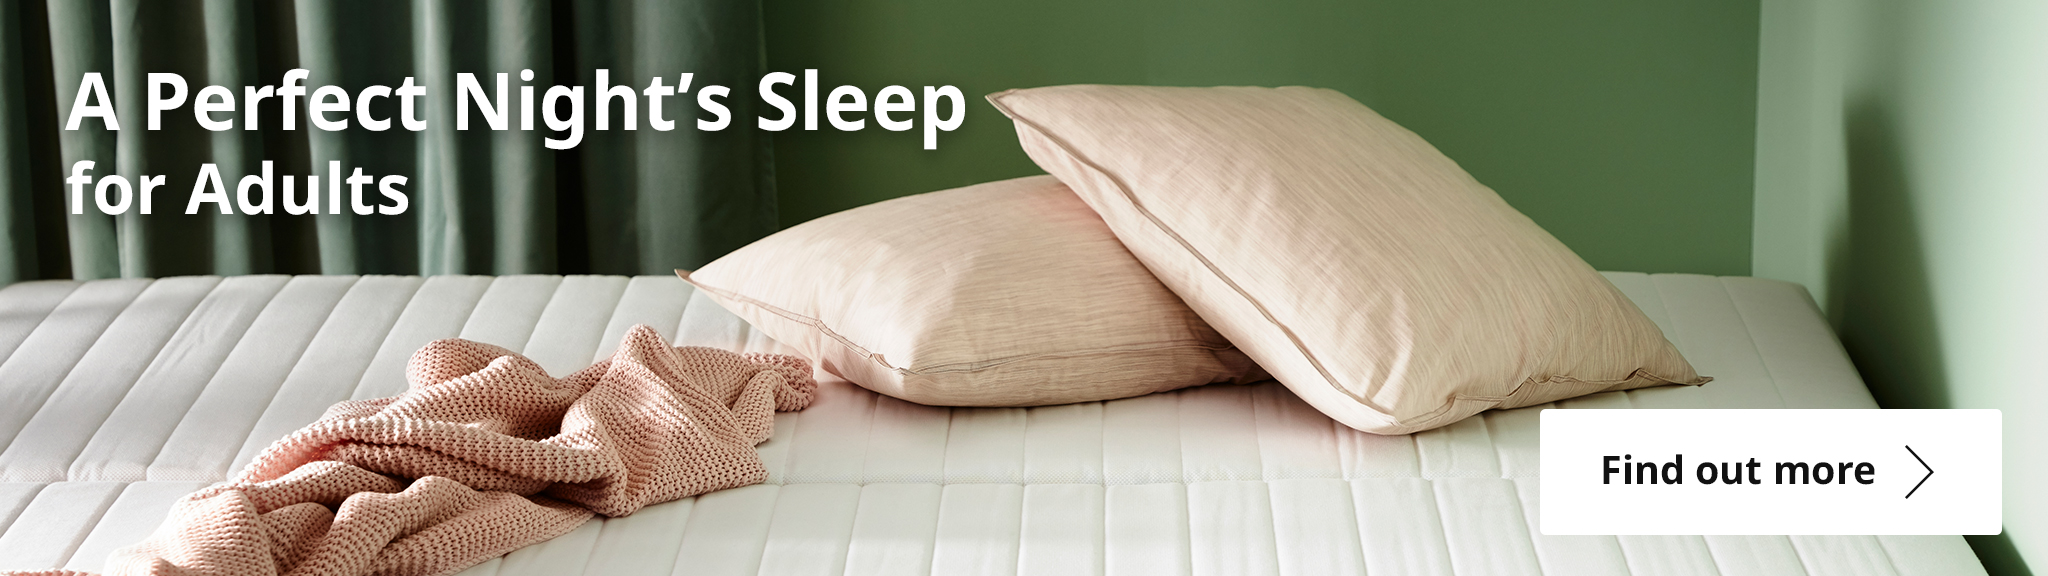 How to sleep better - Adult